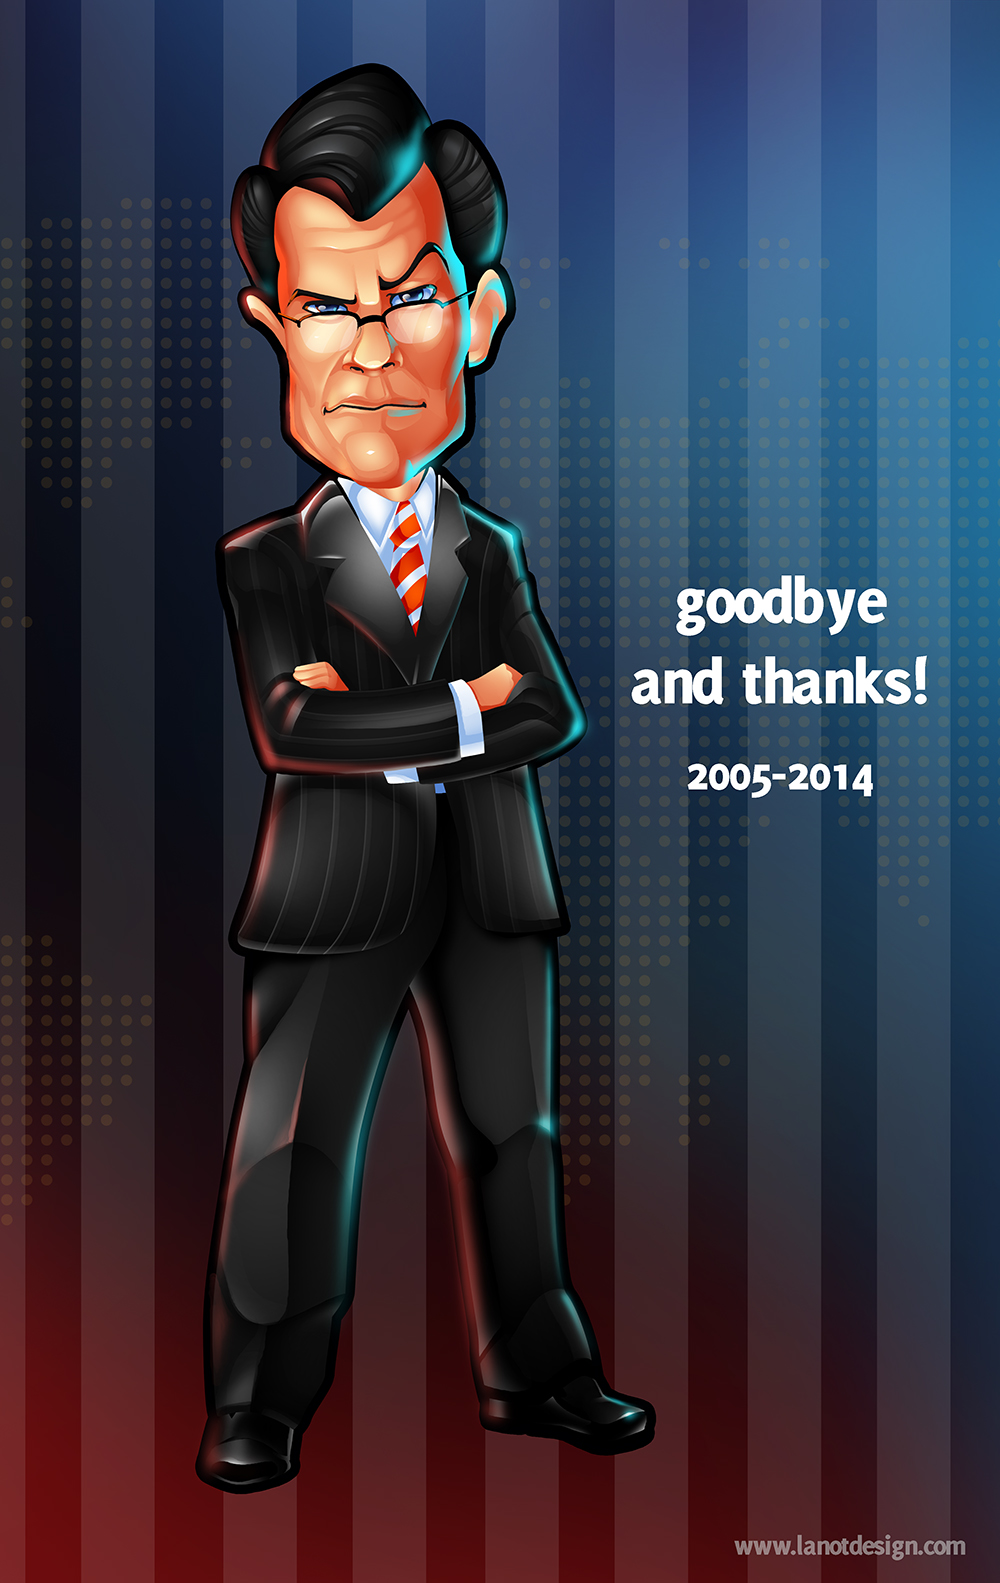 Mr. Colbert